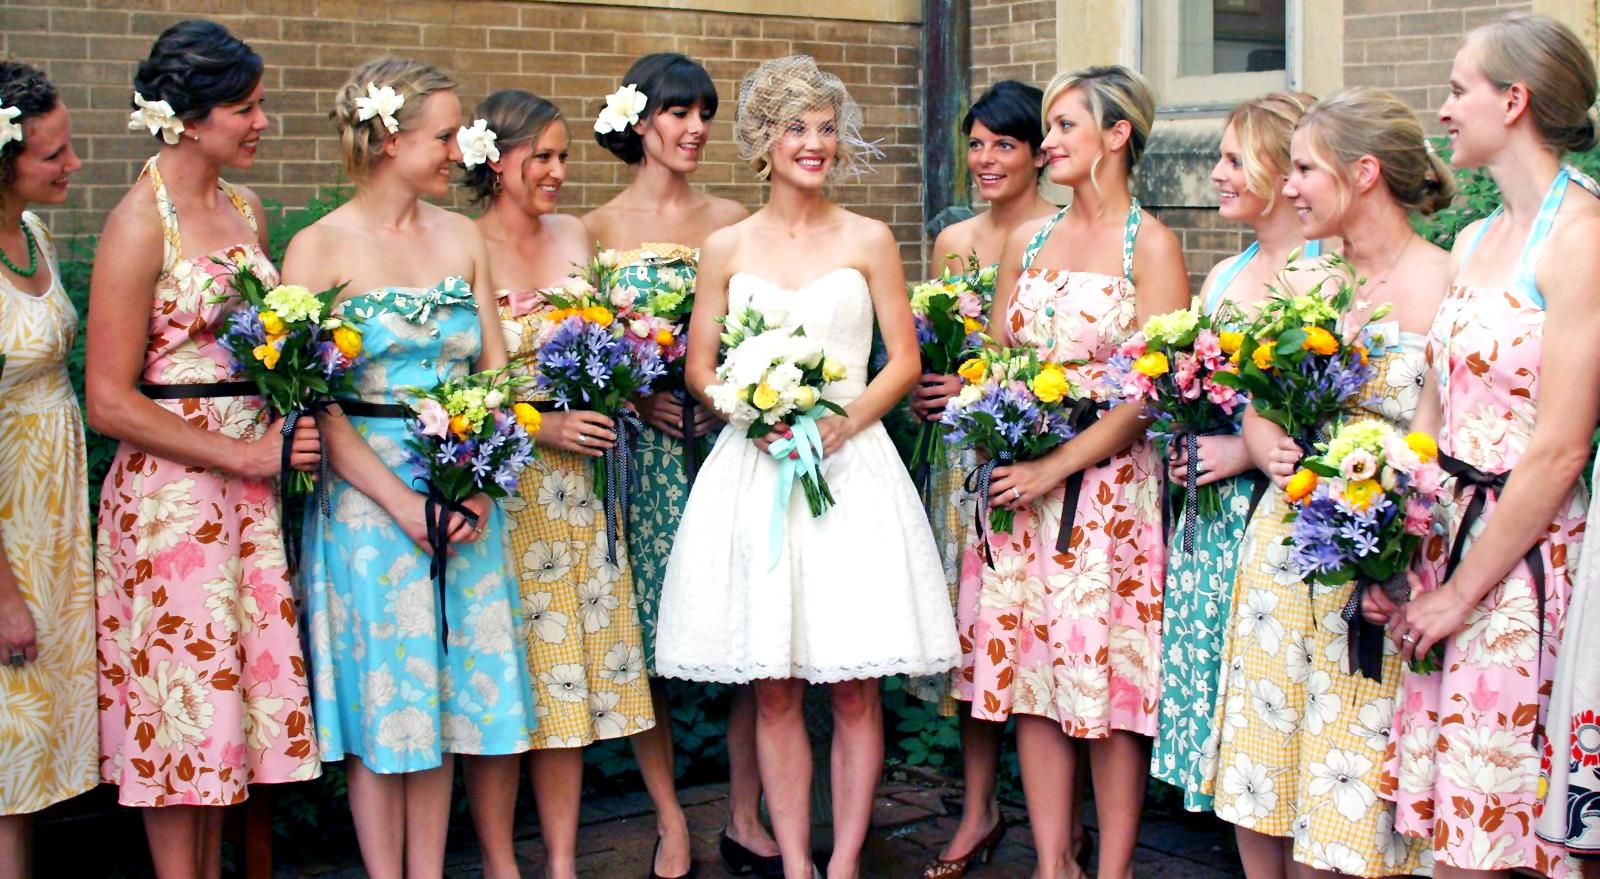 bridesmaid wedding dresses 02 17 Rustic Ideas Plum Pretty Sugar Print Wedding and Printed bridesmaid dresses